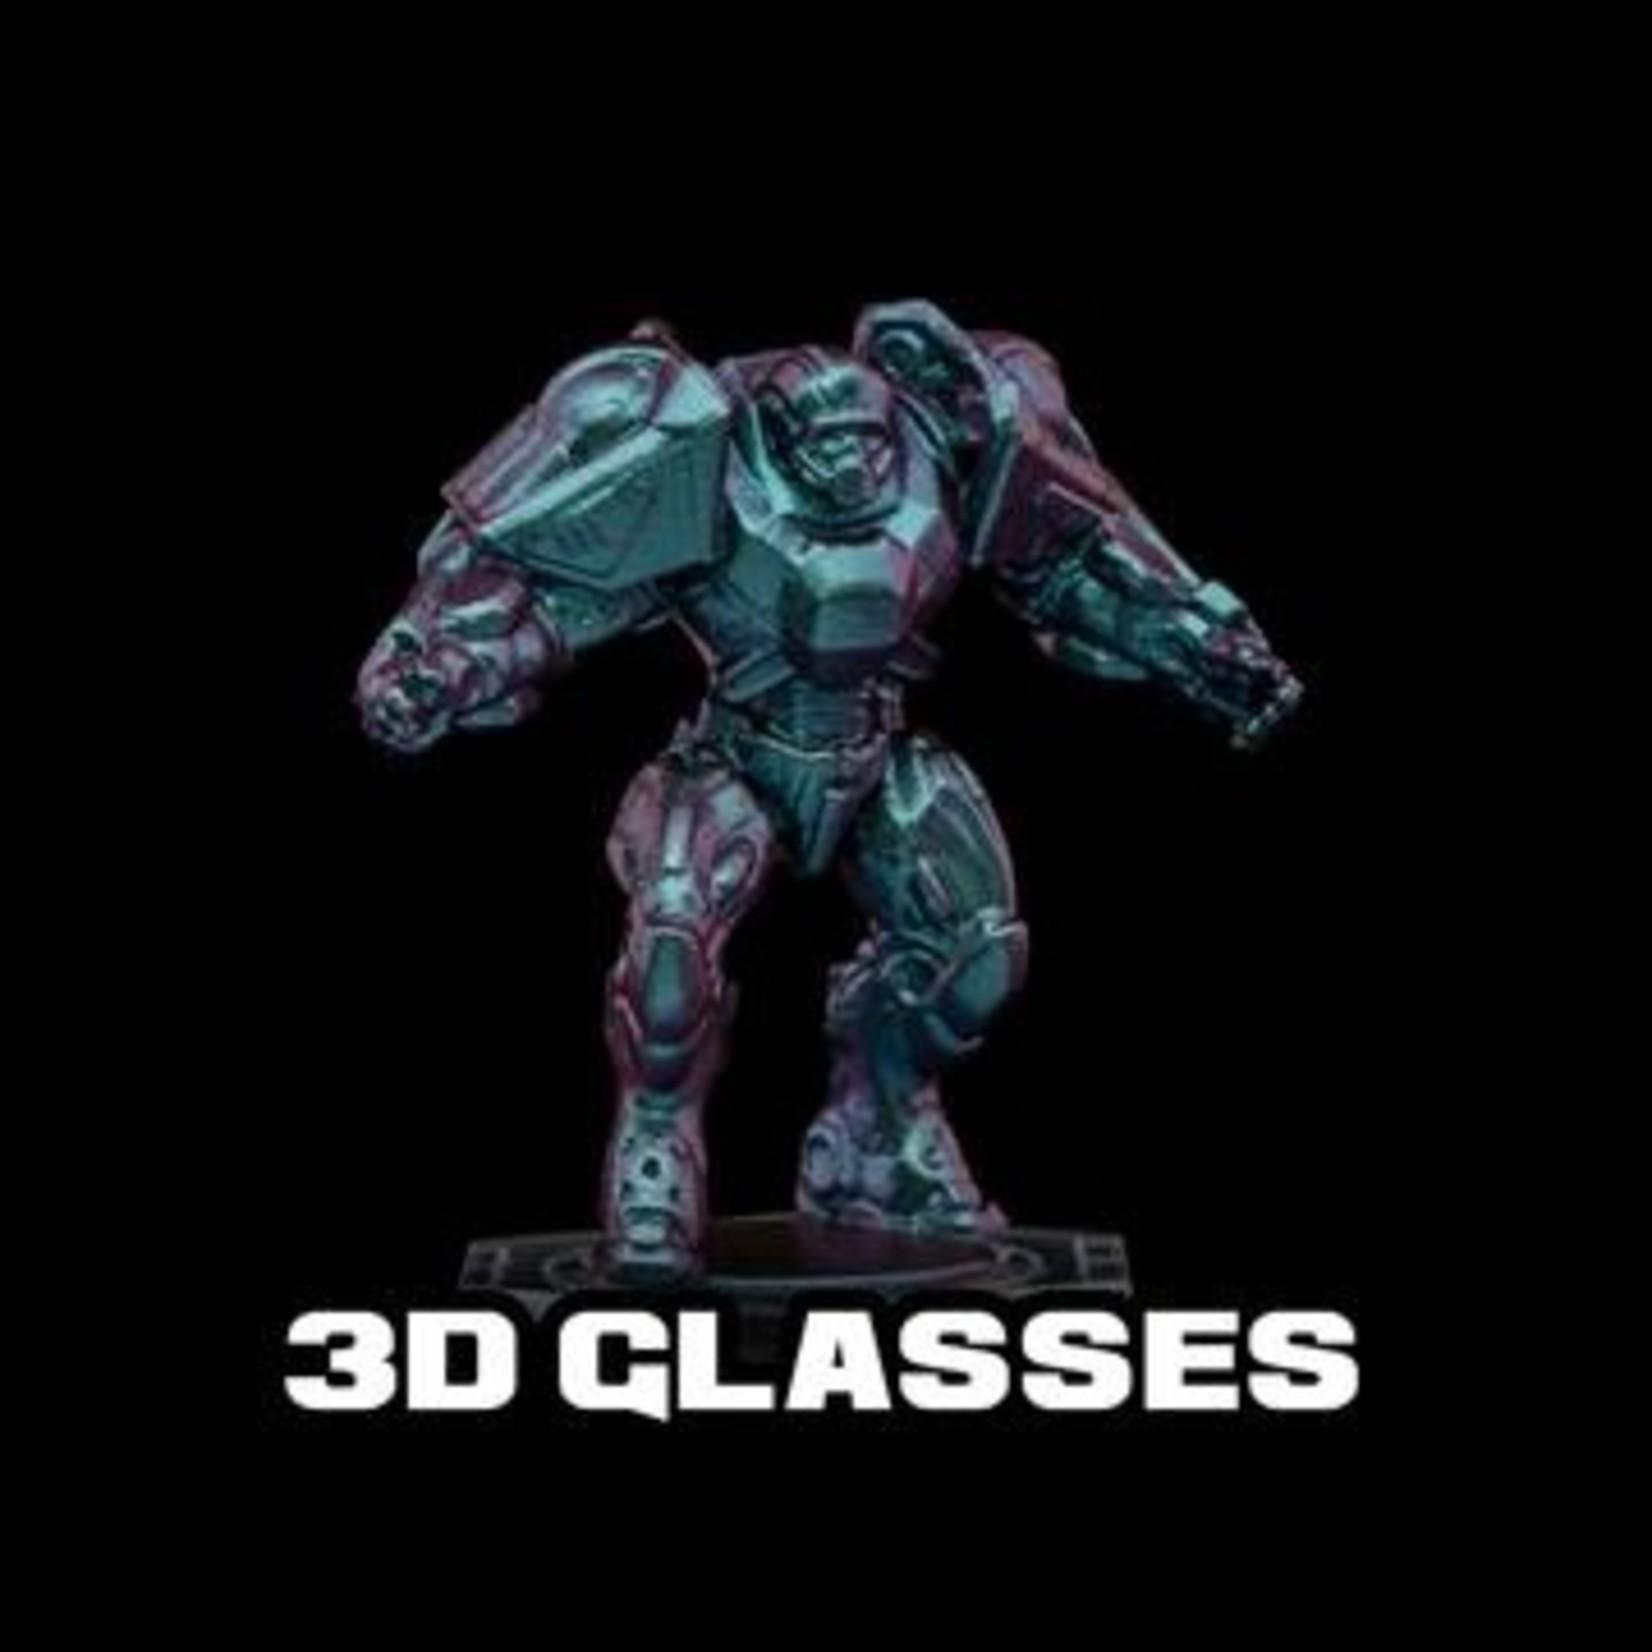 Turbo Dork 3D Glasses (Turboshift)